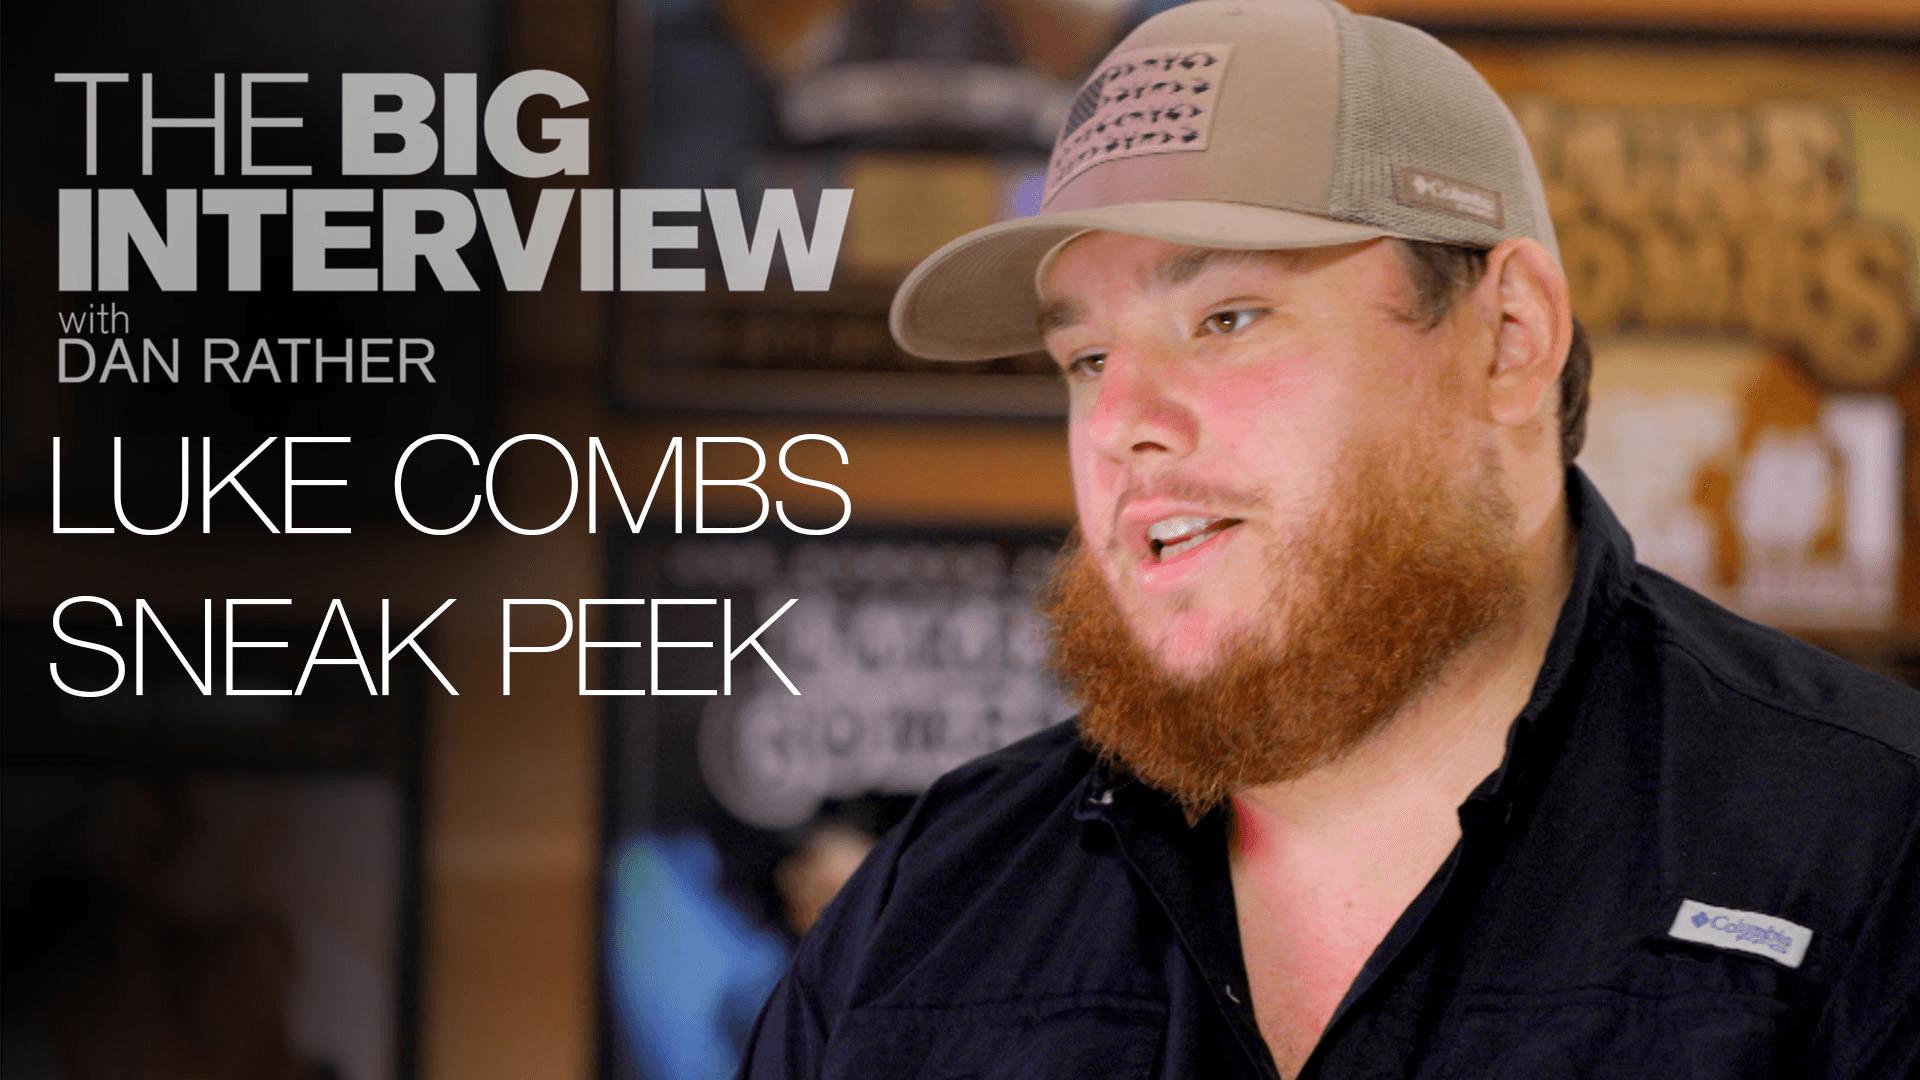 Luke Combs Sneak Peek | The Big Interview with Dan Rather